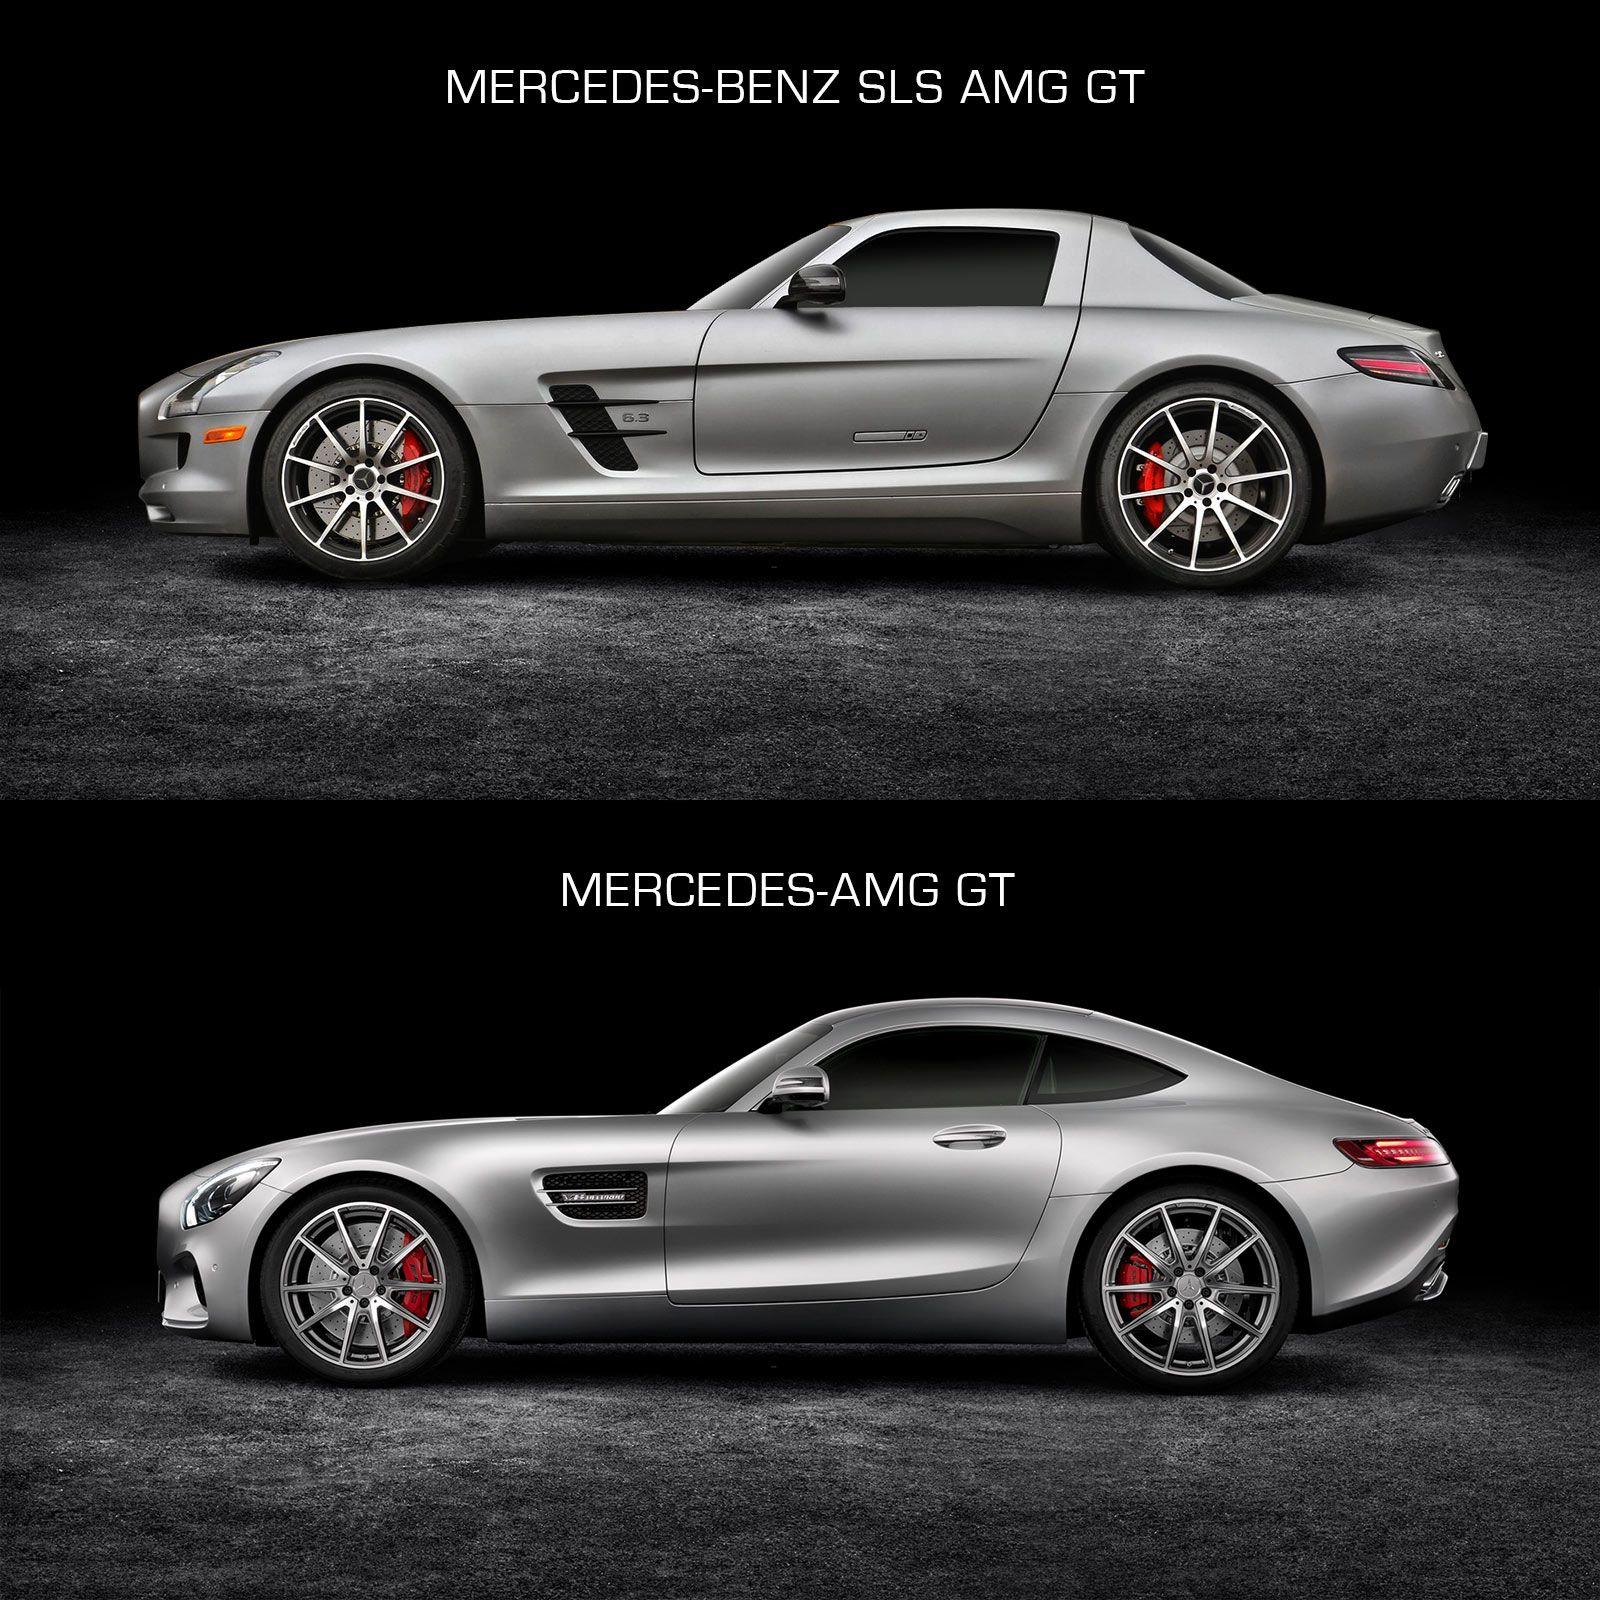 Mercedes Benz Sls Amg Gt And Mercedes Amg Gt Design Comparison